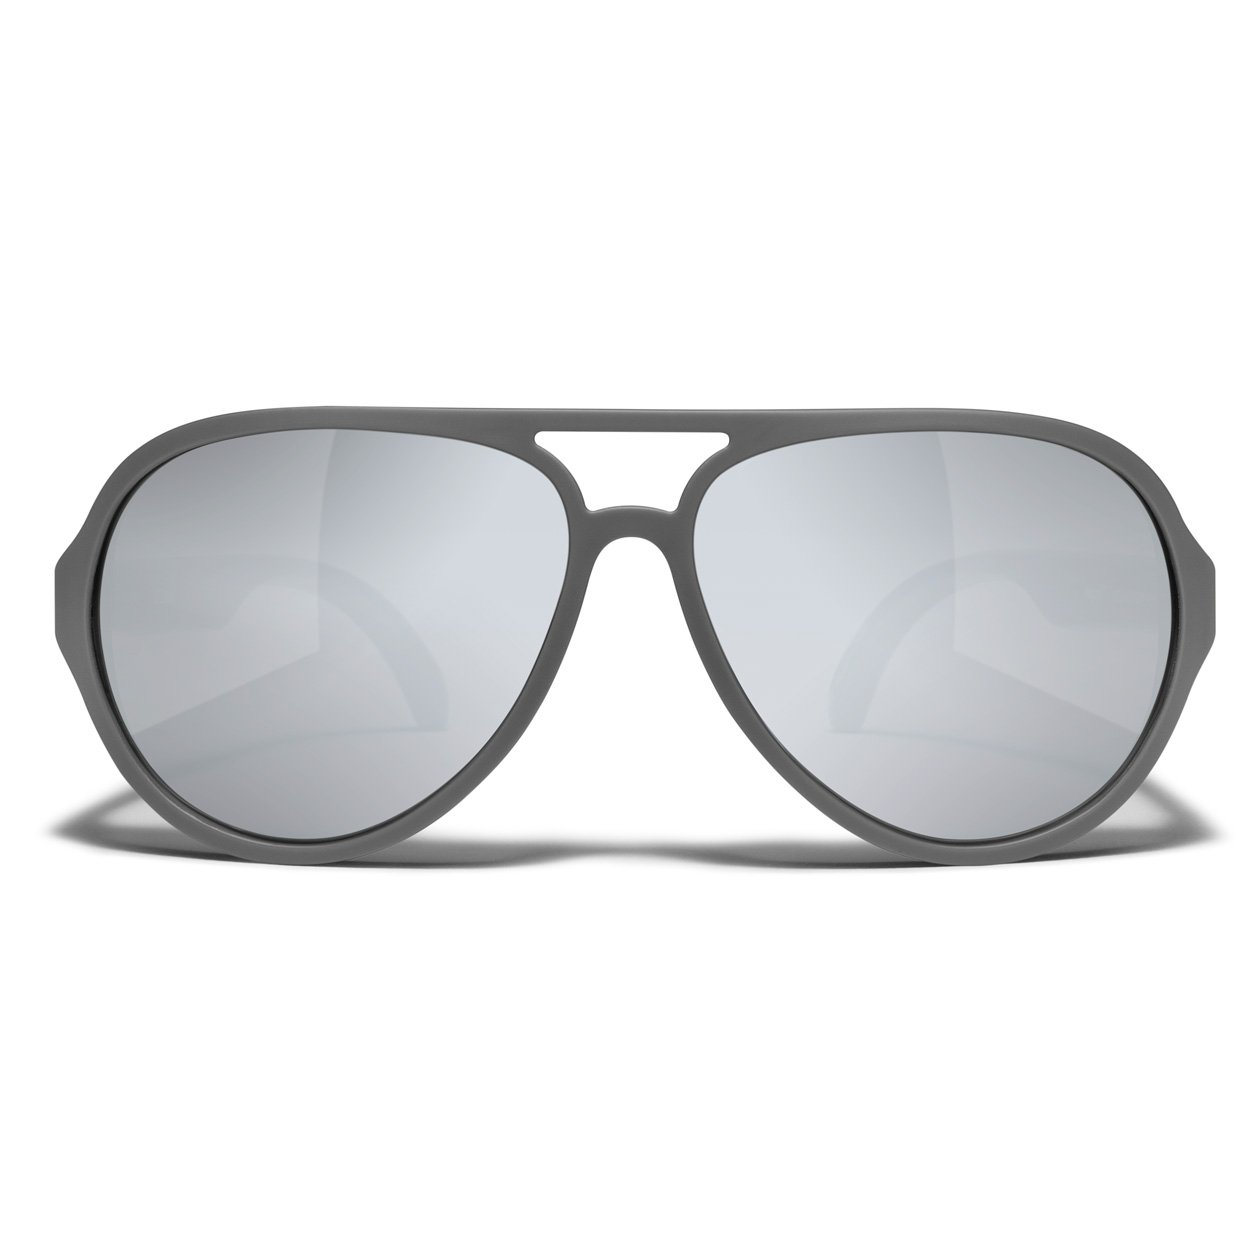 Amazon.com: Gafas de sol magnéticas de Aviator de Distil ...